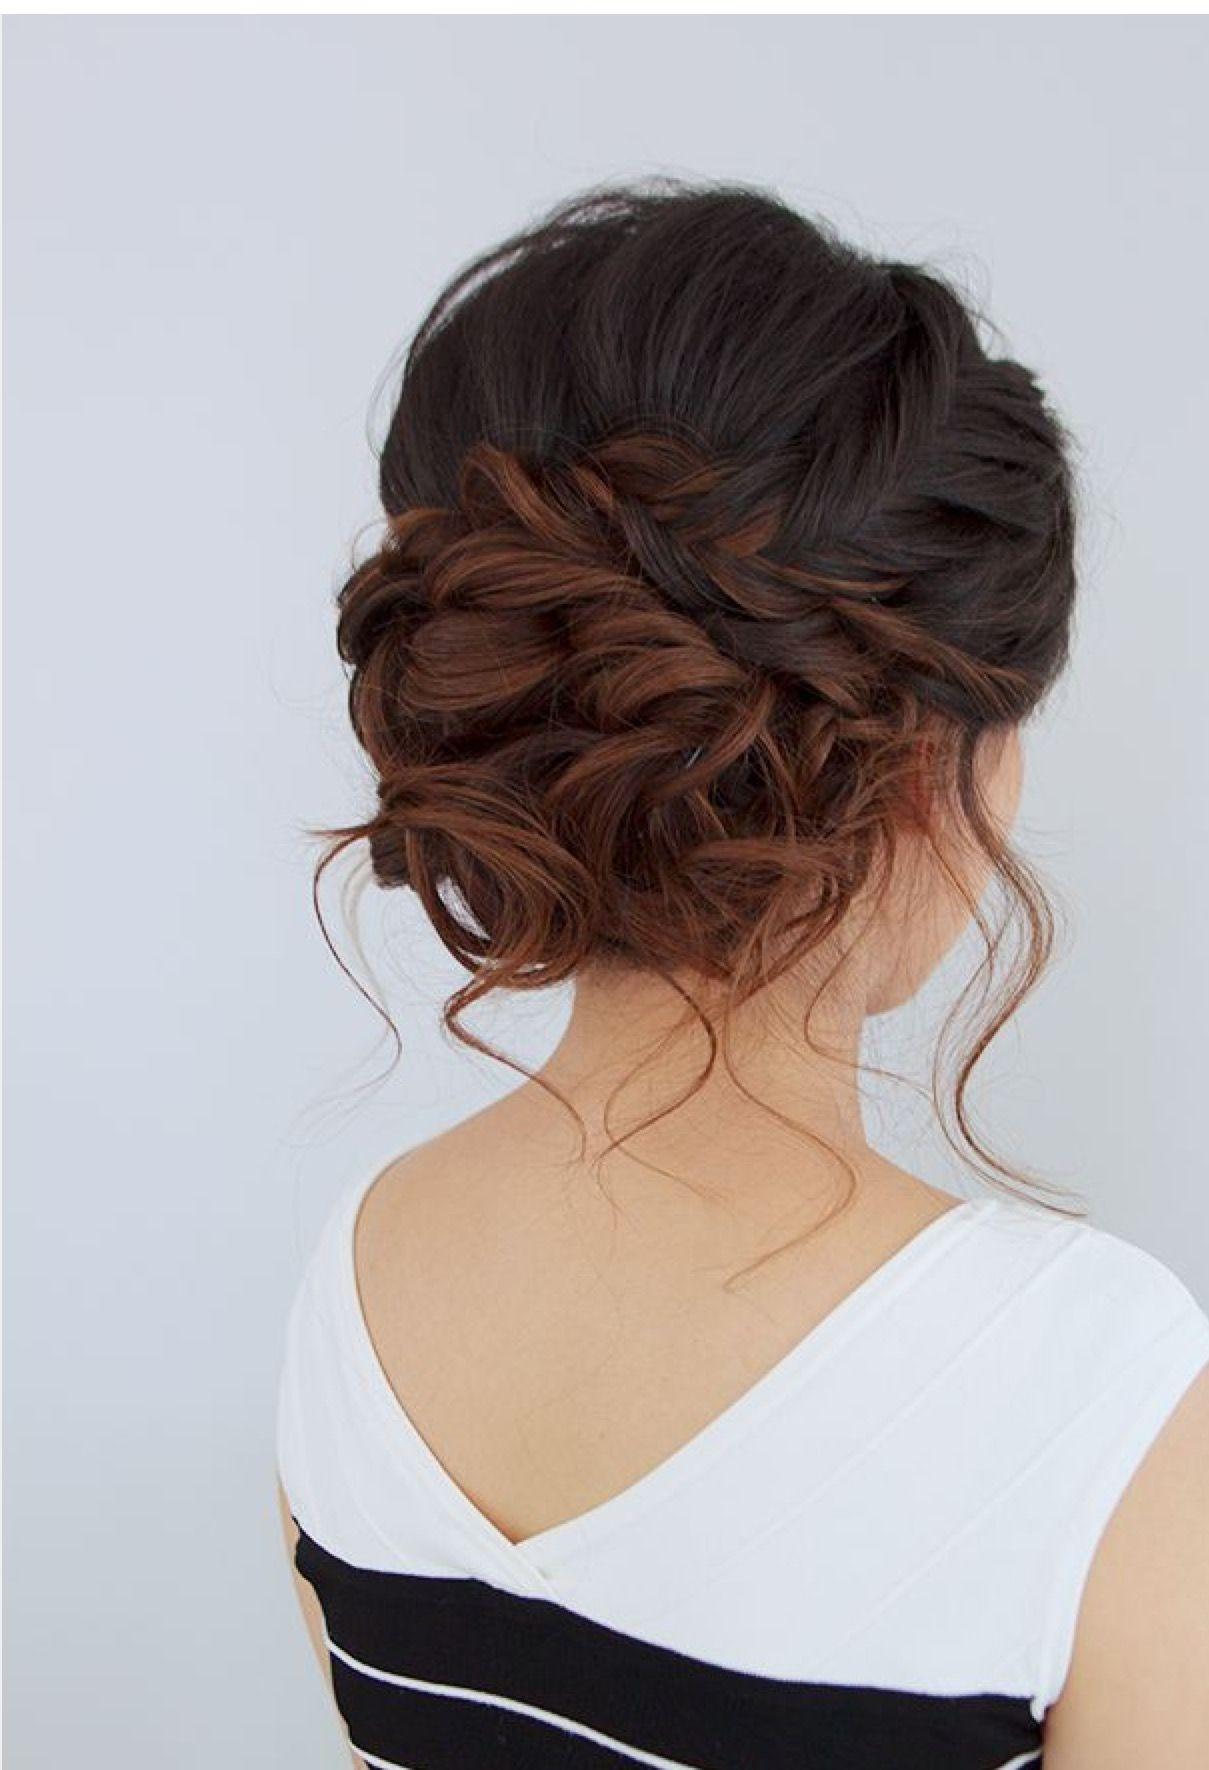 Pin By Amalie Overgaard On Hair Pinterest Frisur Hochgesteckt